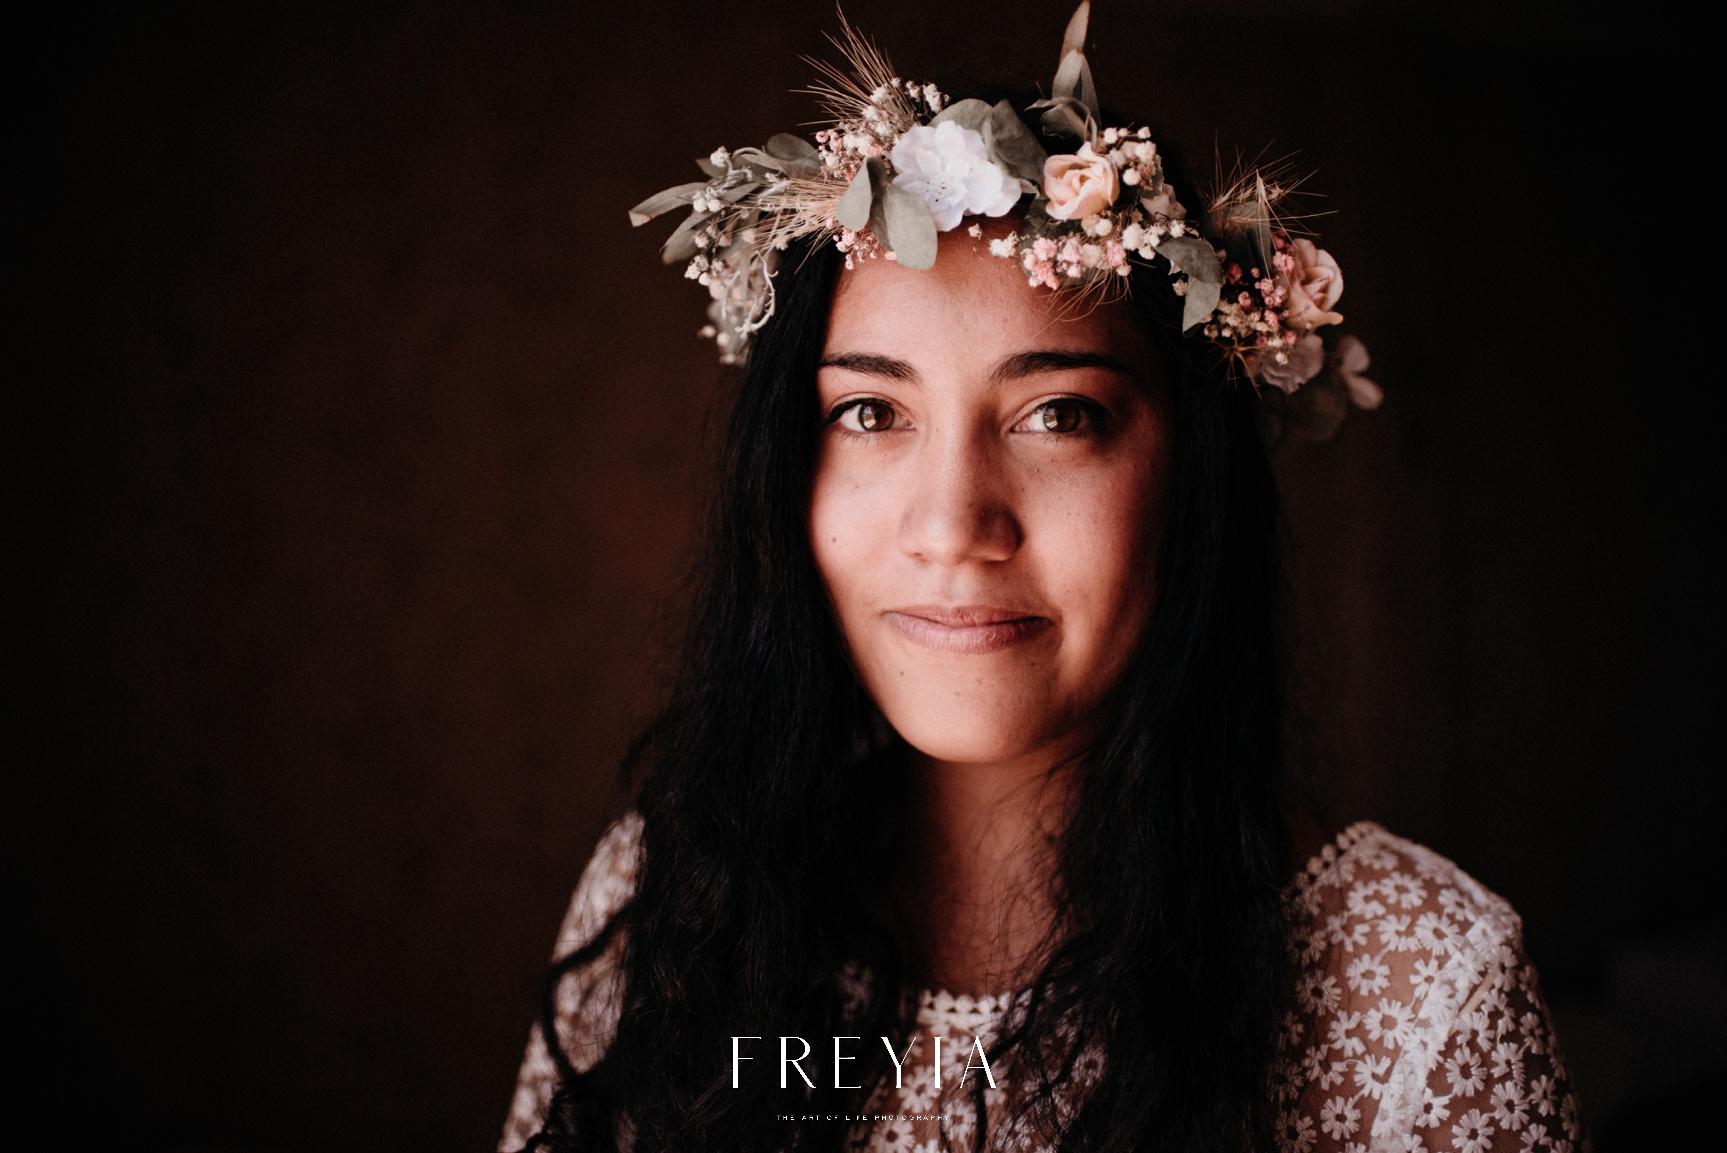 R + T |  mariage reportage alternatif moody intime minimaliste vintage naturel boho boheme |  PHOTOGRAPHE mariage PARIS france destination  | FREYIA photography_-120.jpg